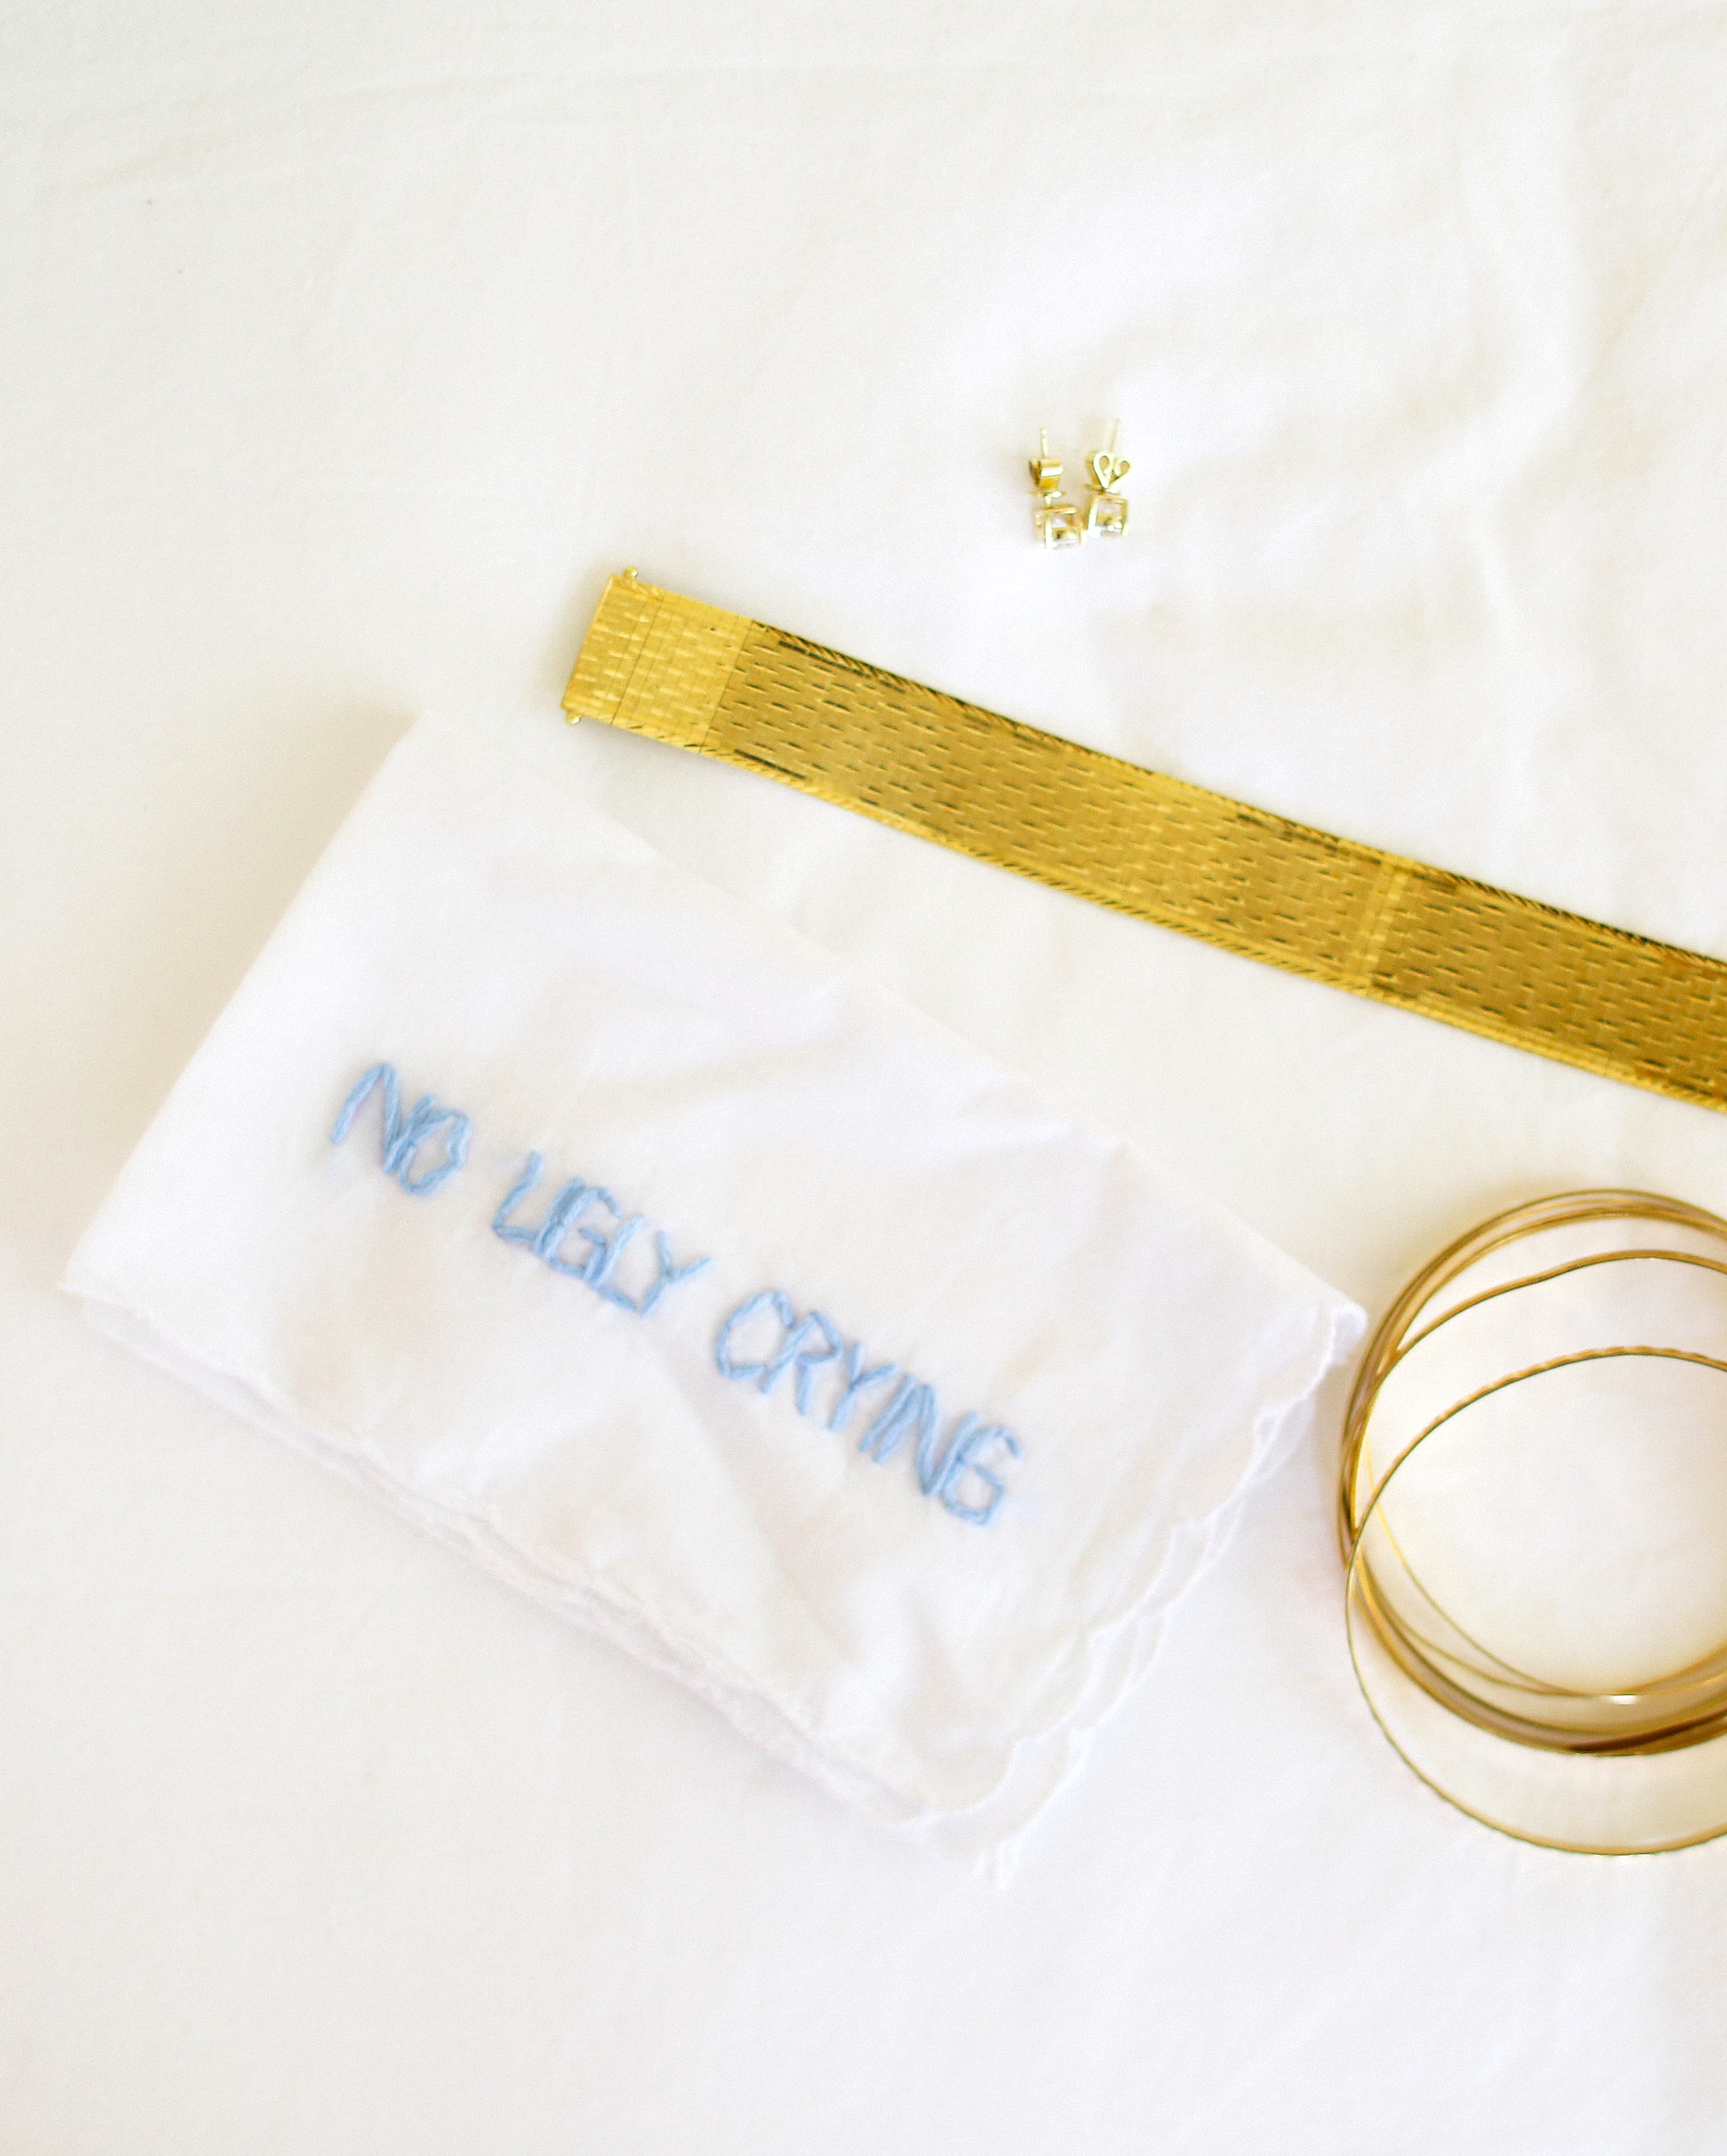 olivia-keith-wedding-accessories-19-s112304-0815.jpg